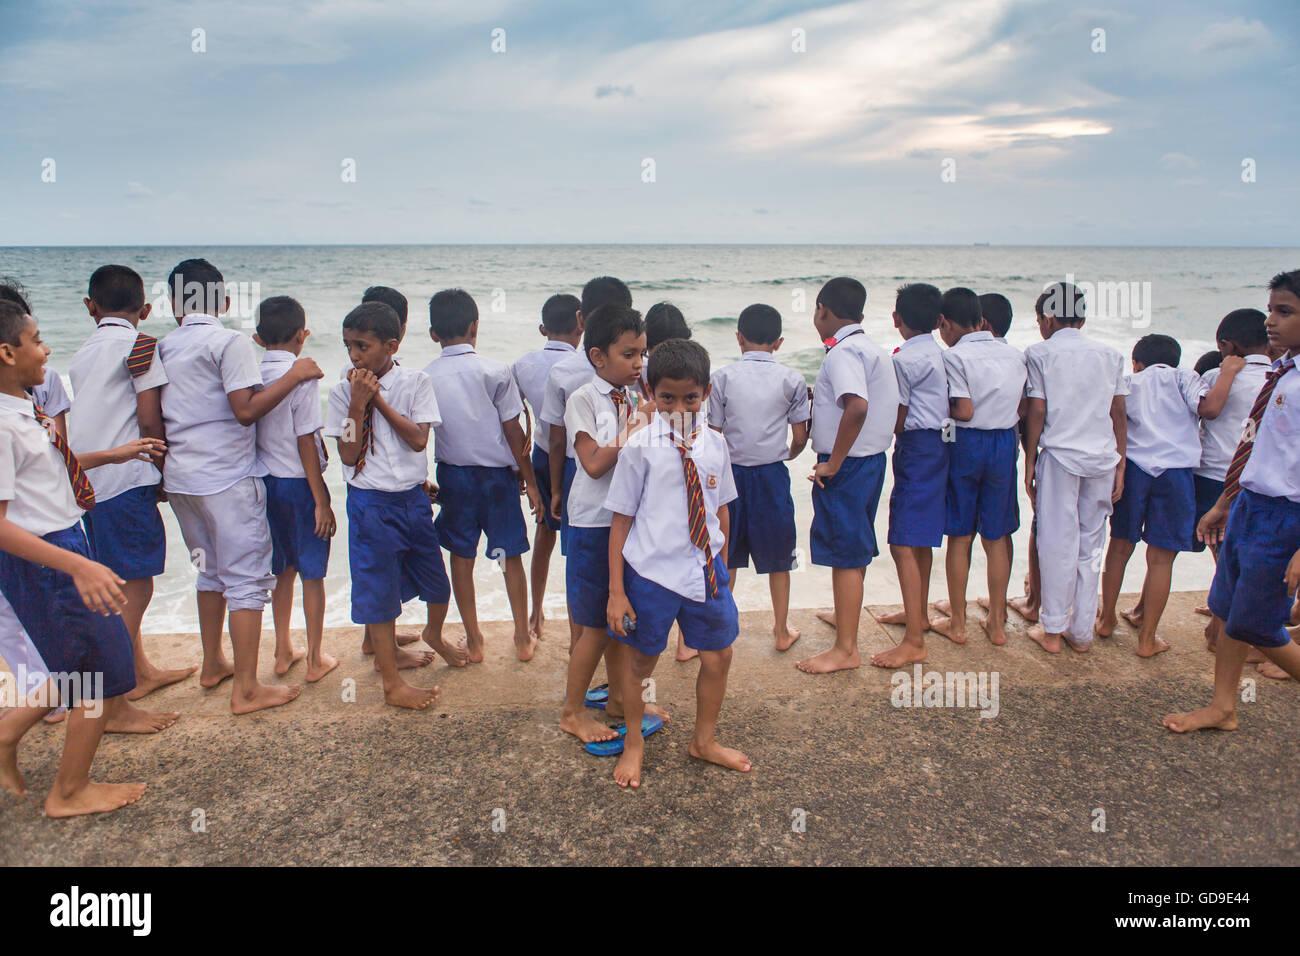 schoolchildren on the promenade at Galle Face Green, Sri Lanka - Stock Image